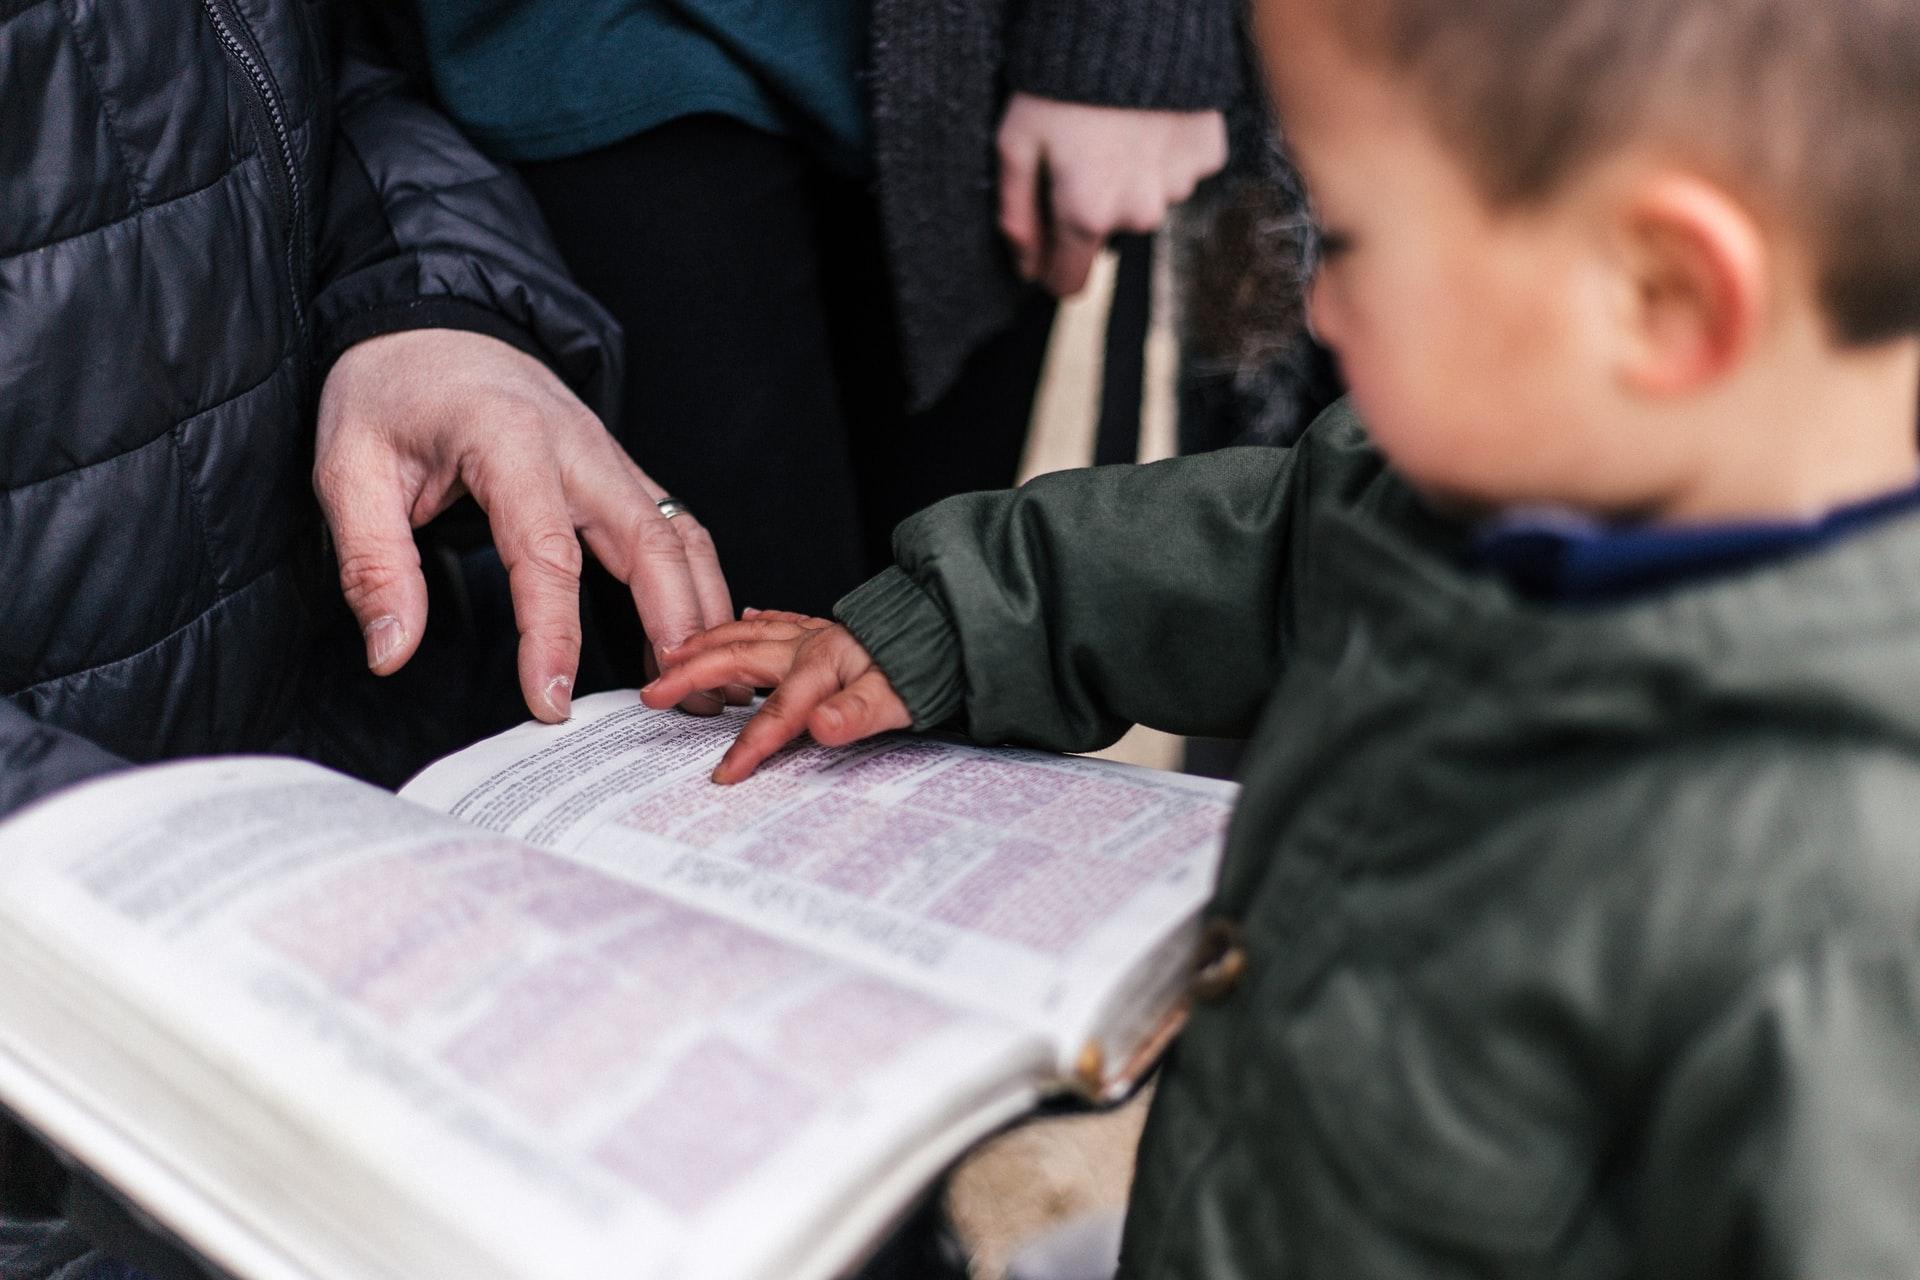 Pojke pekar i Bibel